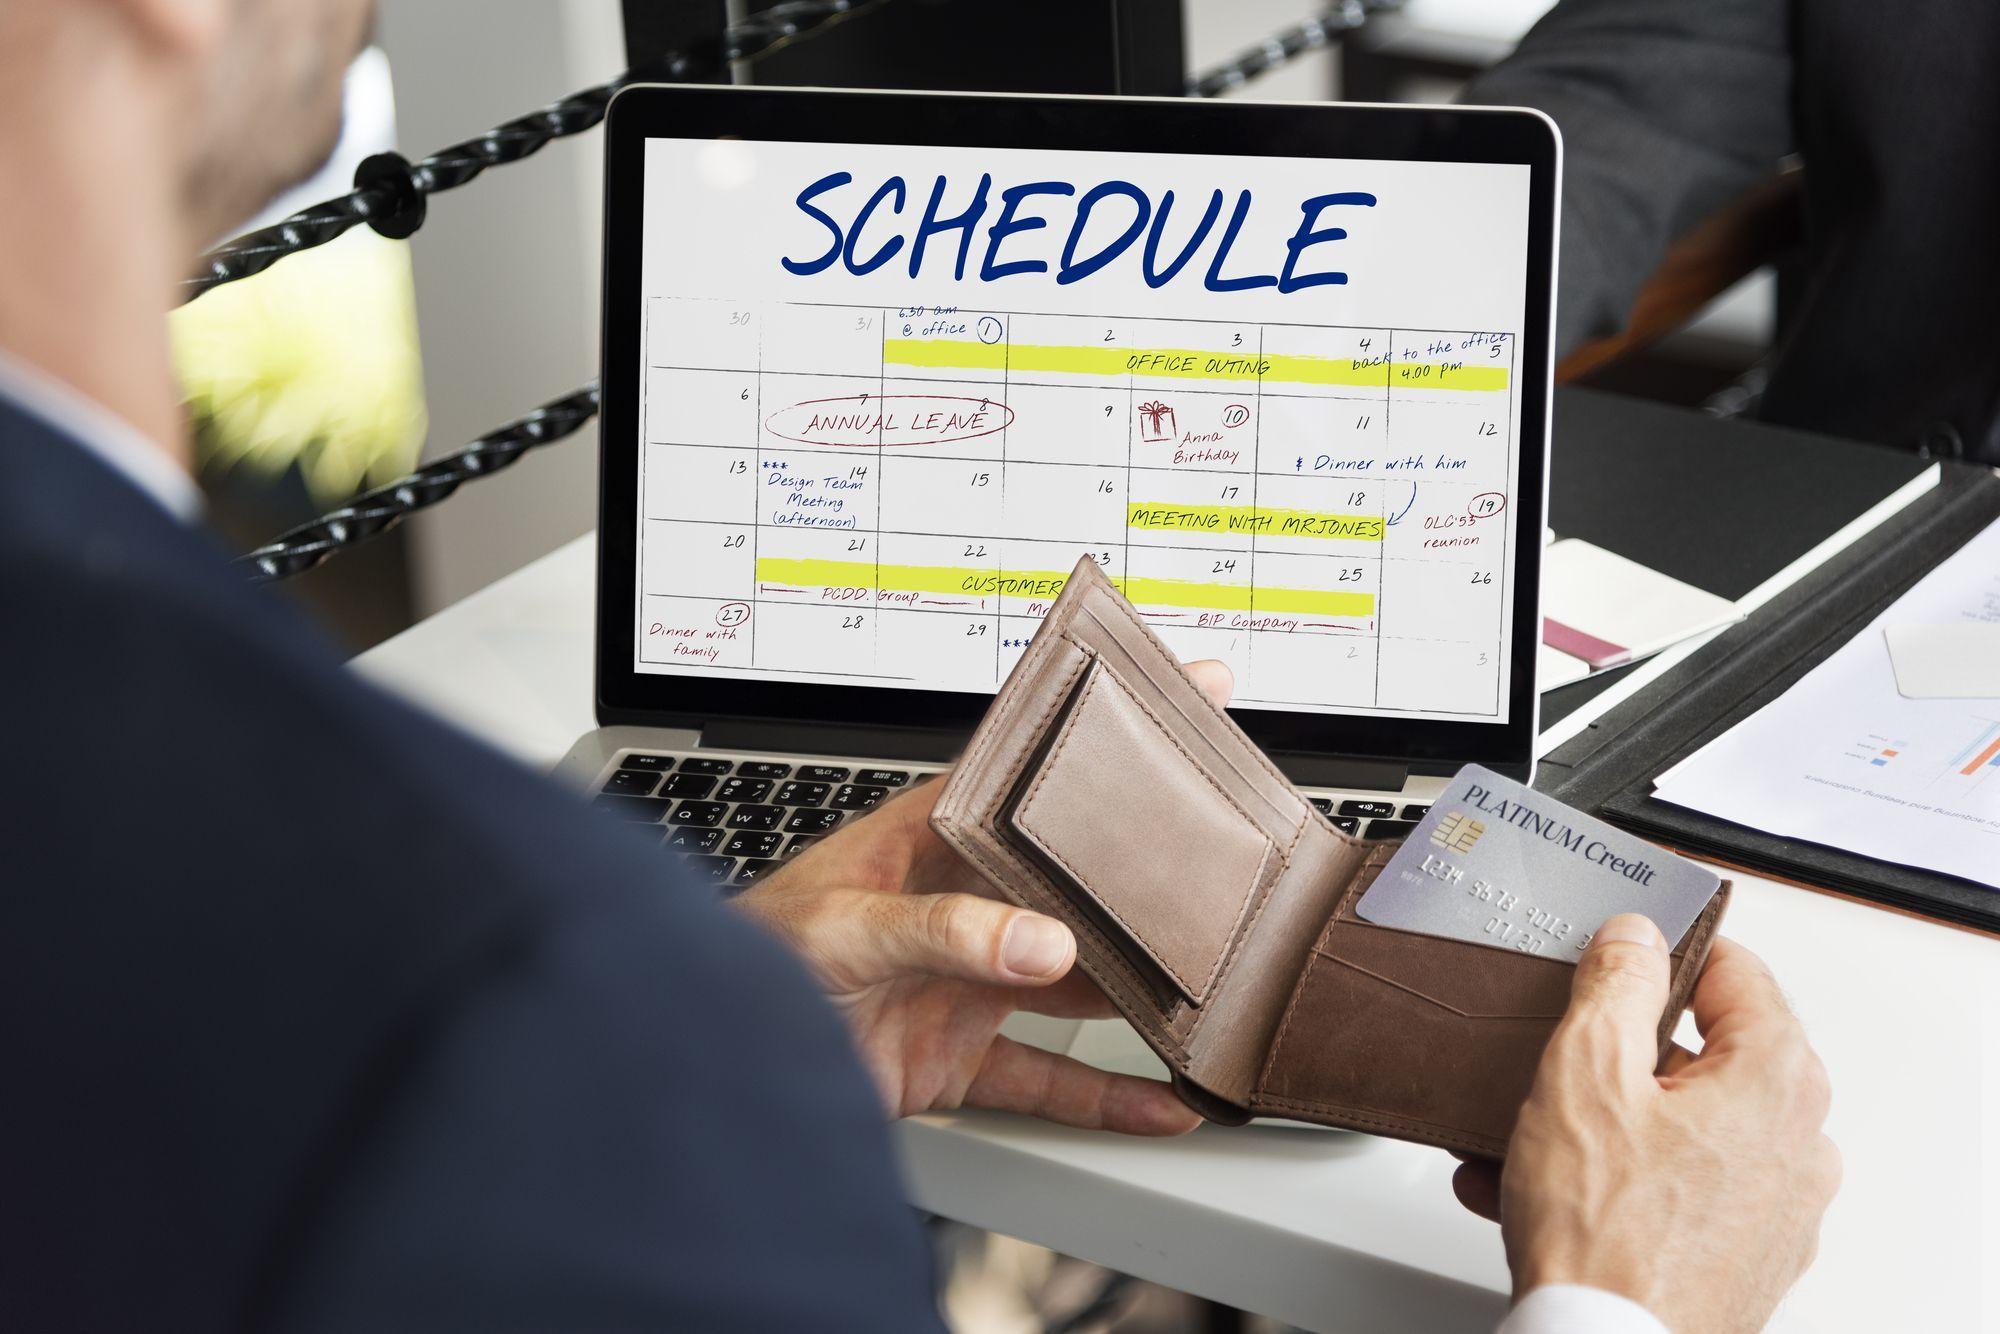 JCBカードの締め日・支払い日を解説!引き落としタイミングを把握して残高不足を防ぐ方法